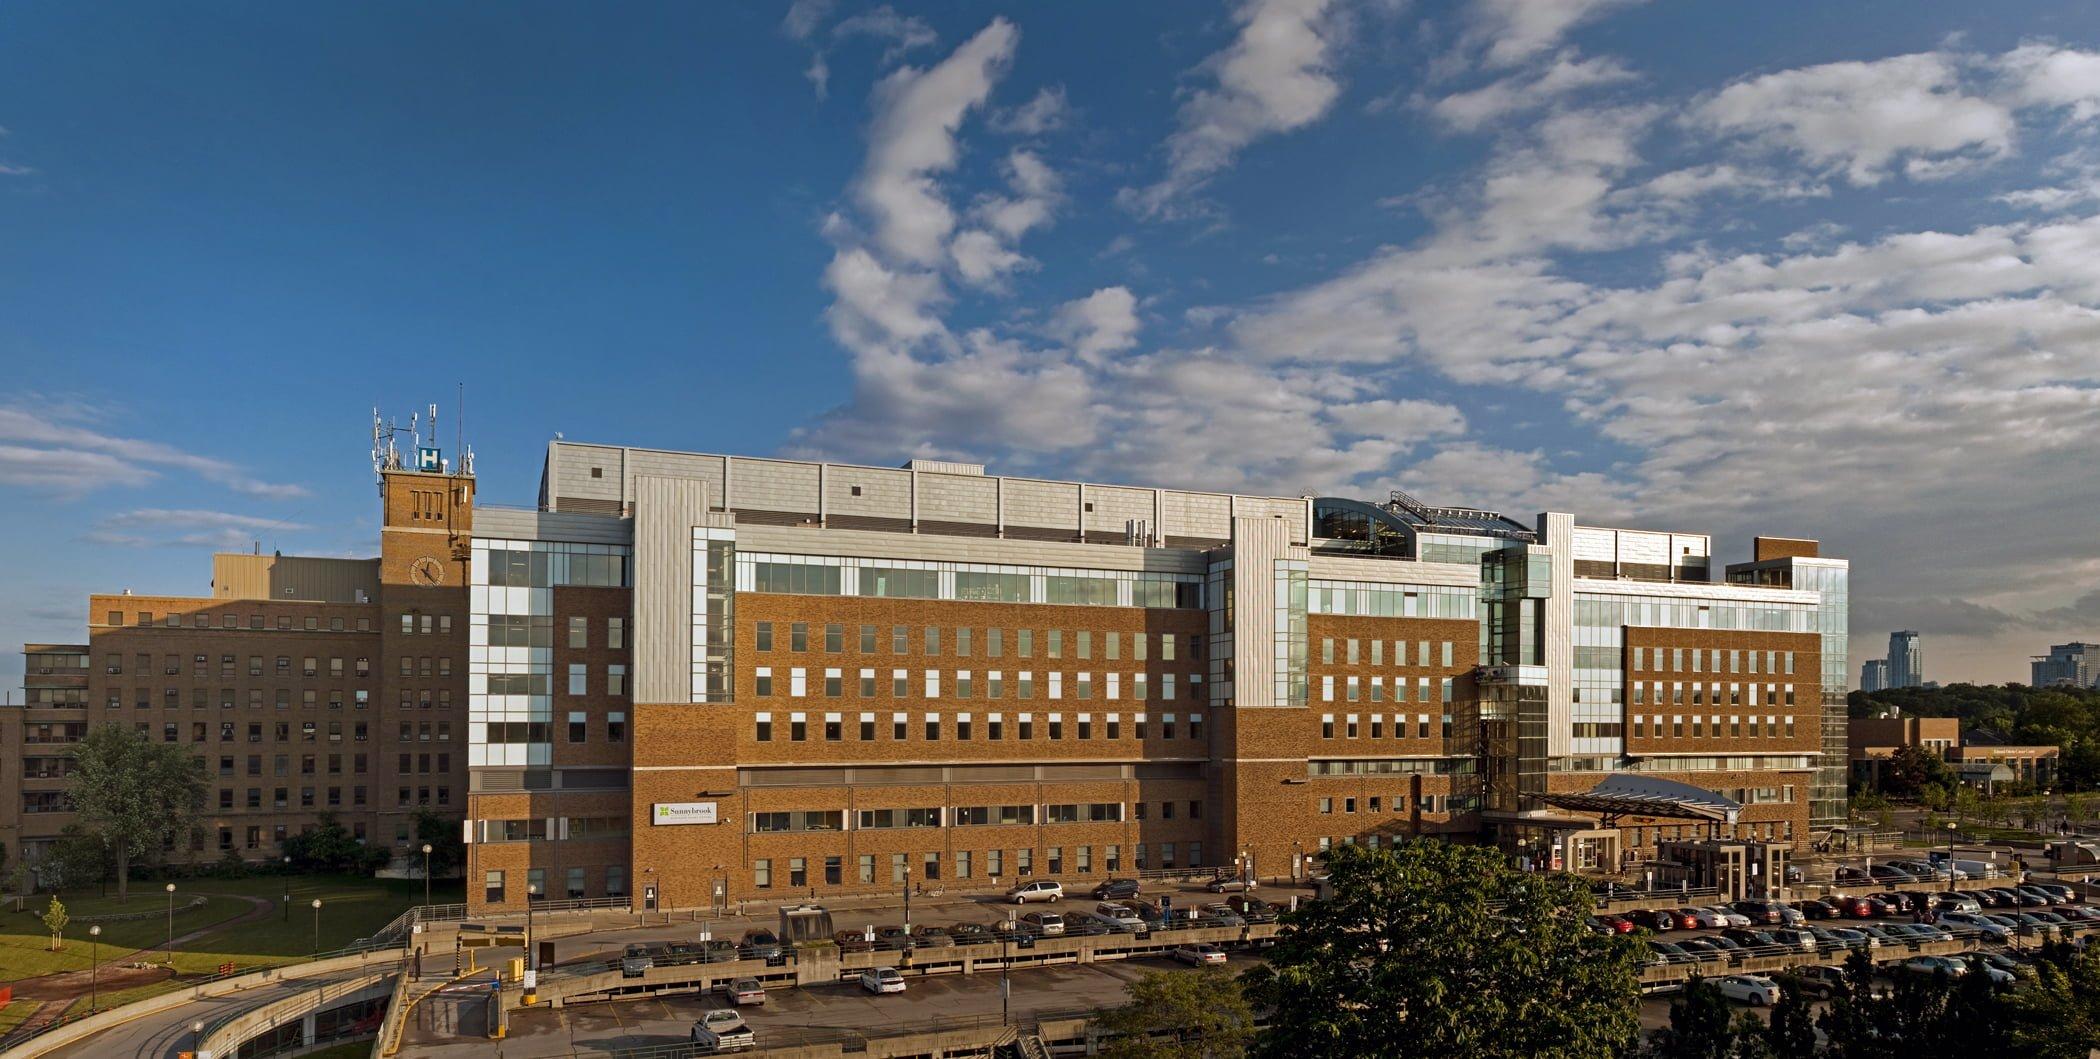 Sunnybrook Hospital